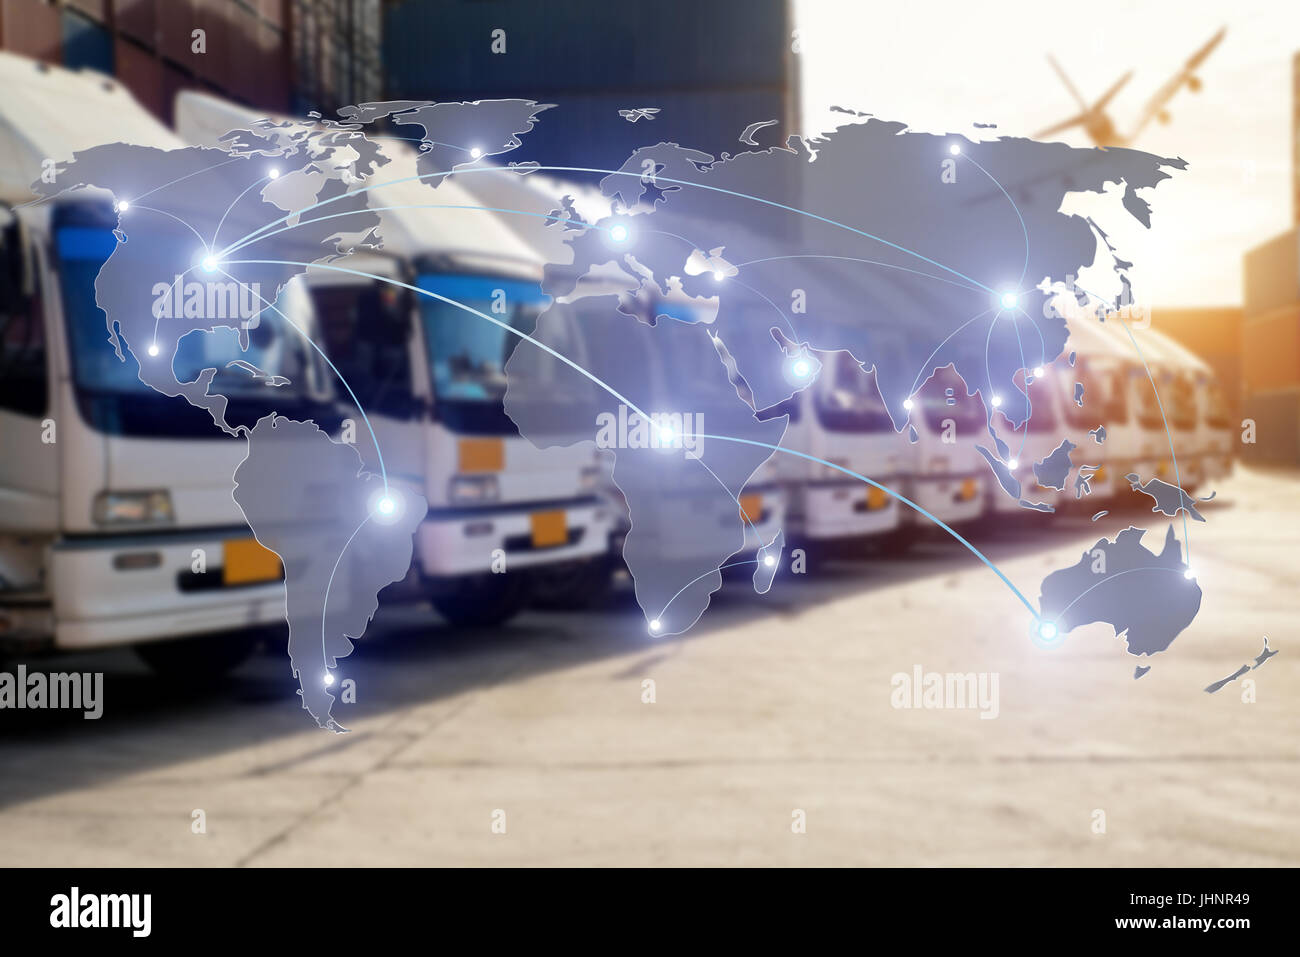 Mapa de asociación mundial de logística la conexión de contenedores de carga de camiones de mercancías Imagen De Stock